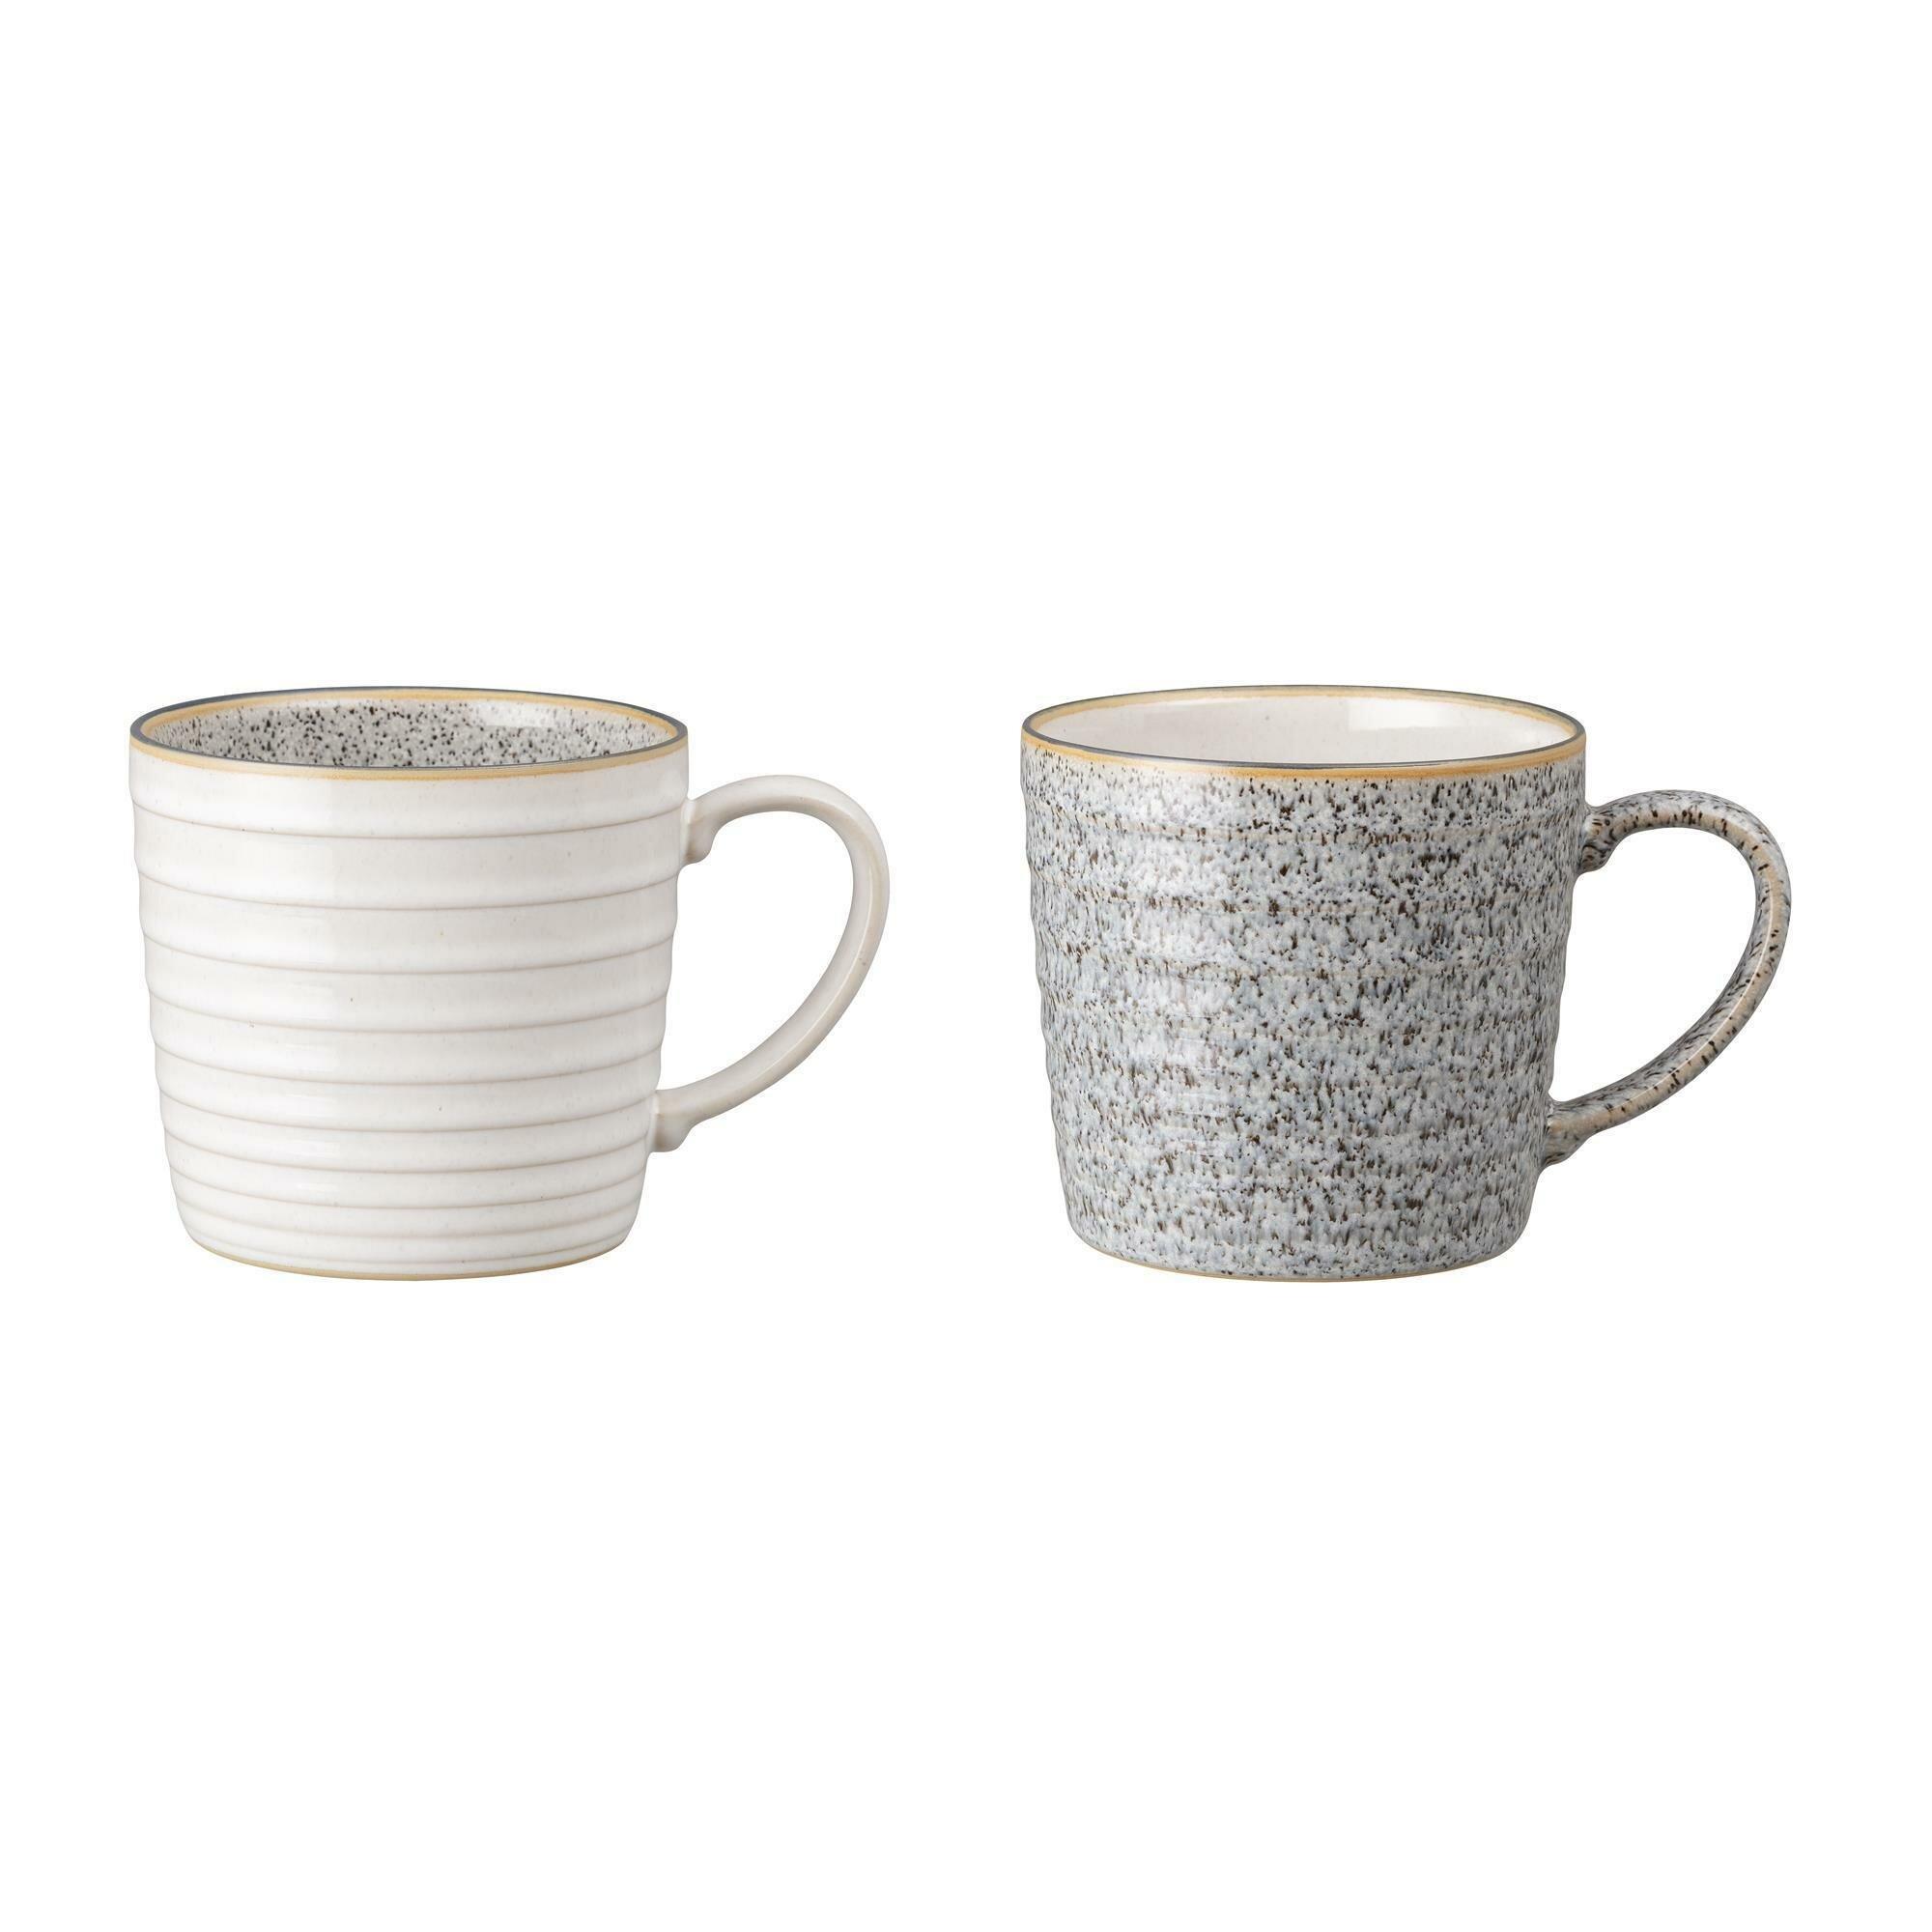 Denby Studio Grey 2 Piece Coffee Mug Set Reviews Wayfair